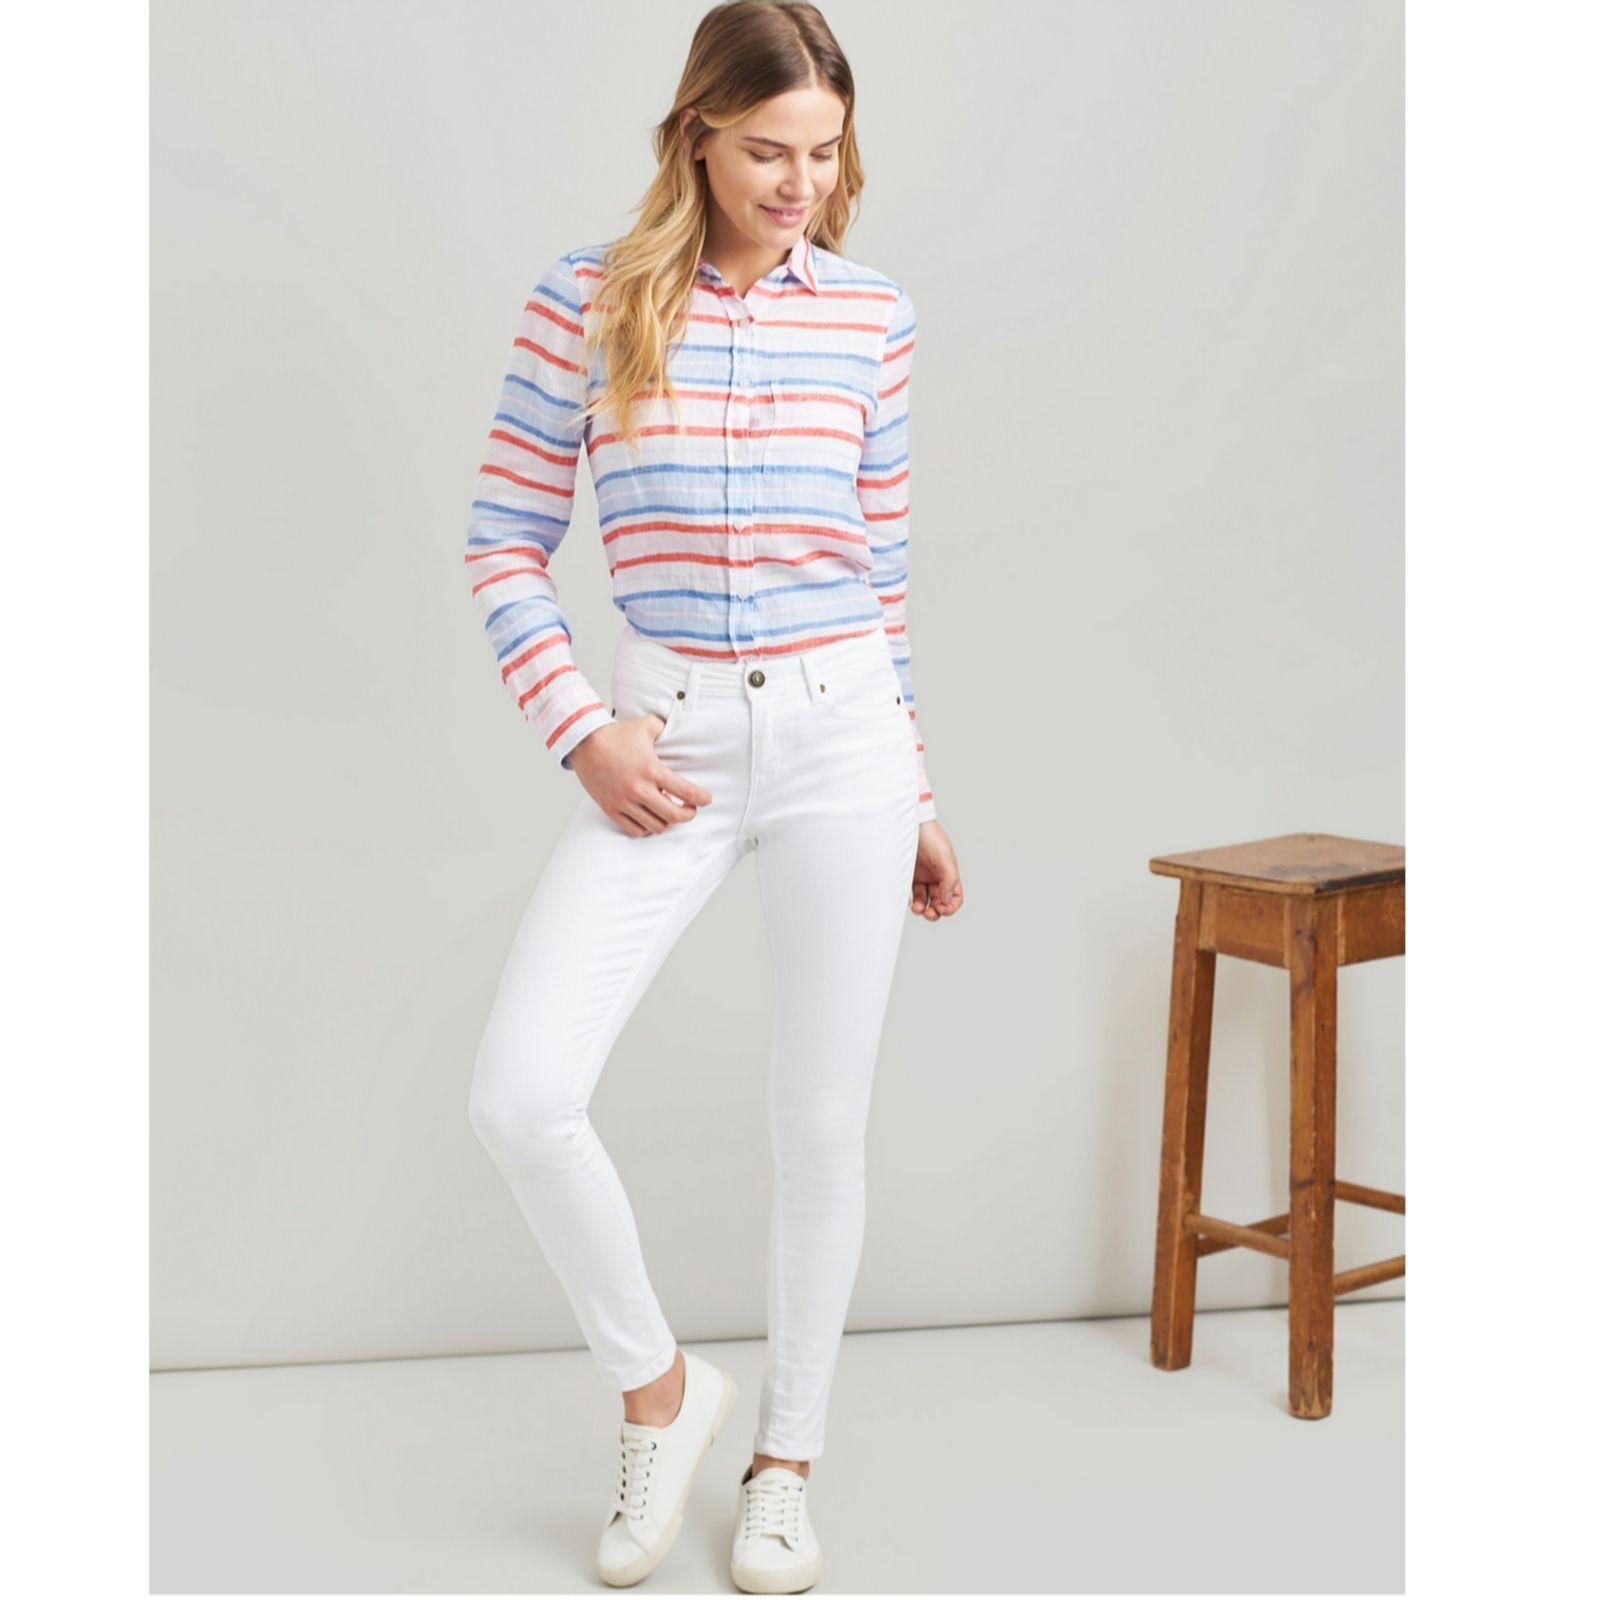 JOULES Monroe Super Skinny Jeans Dark Indigo Sz 18 RRP£59.95 FreeUKP/&P